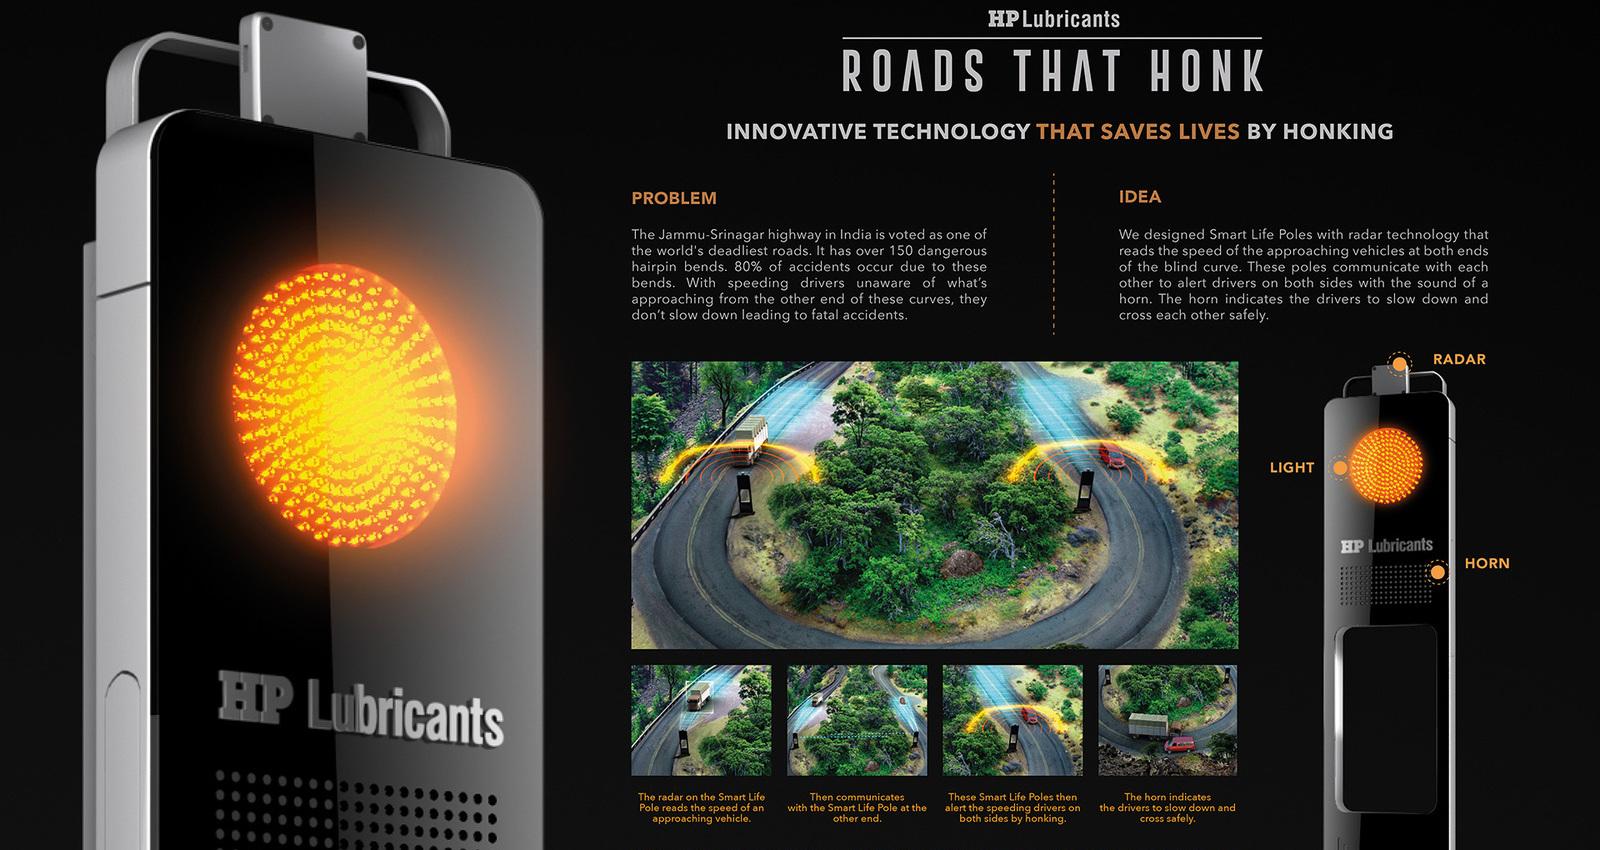 Roads That Honk